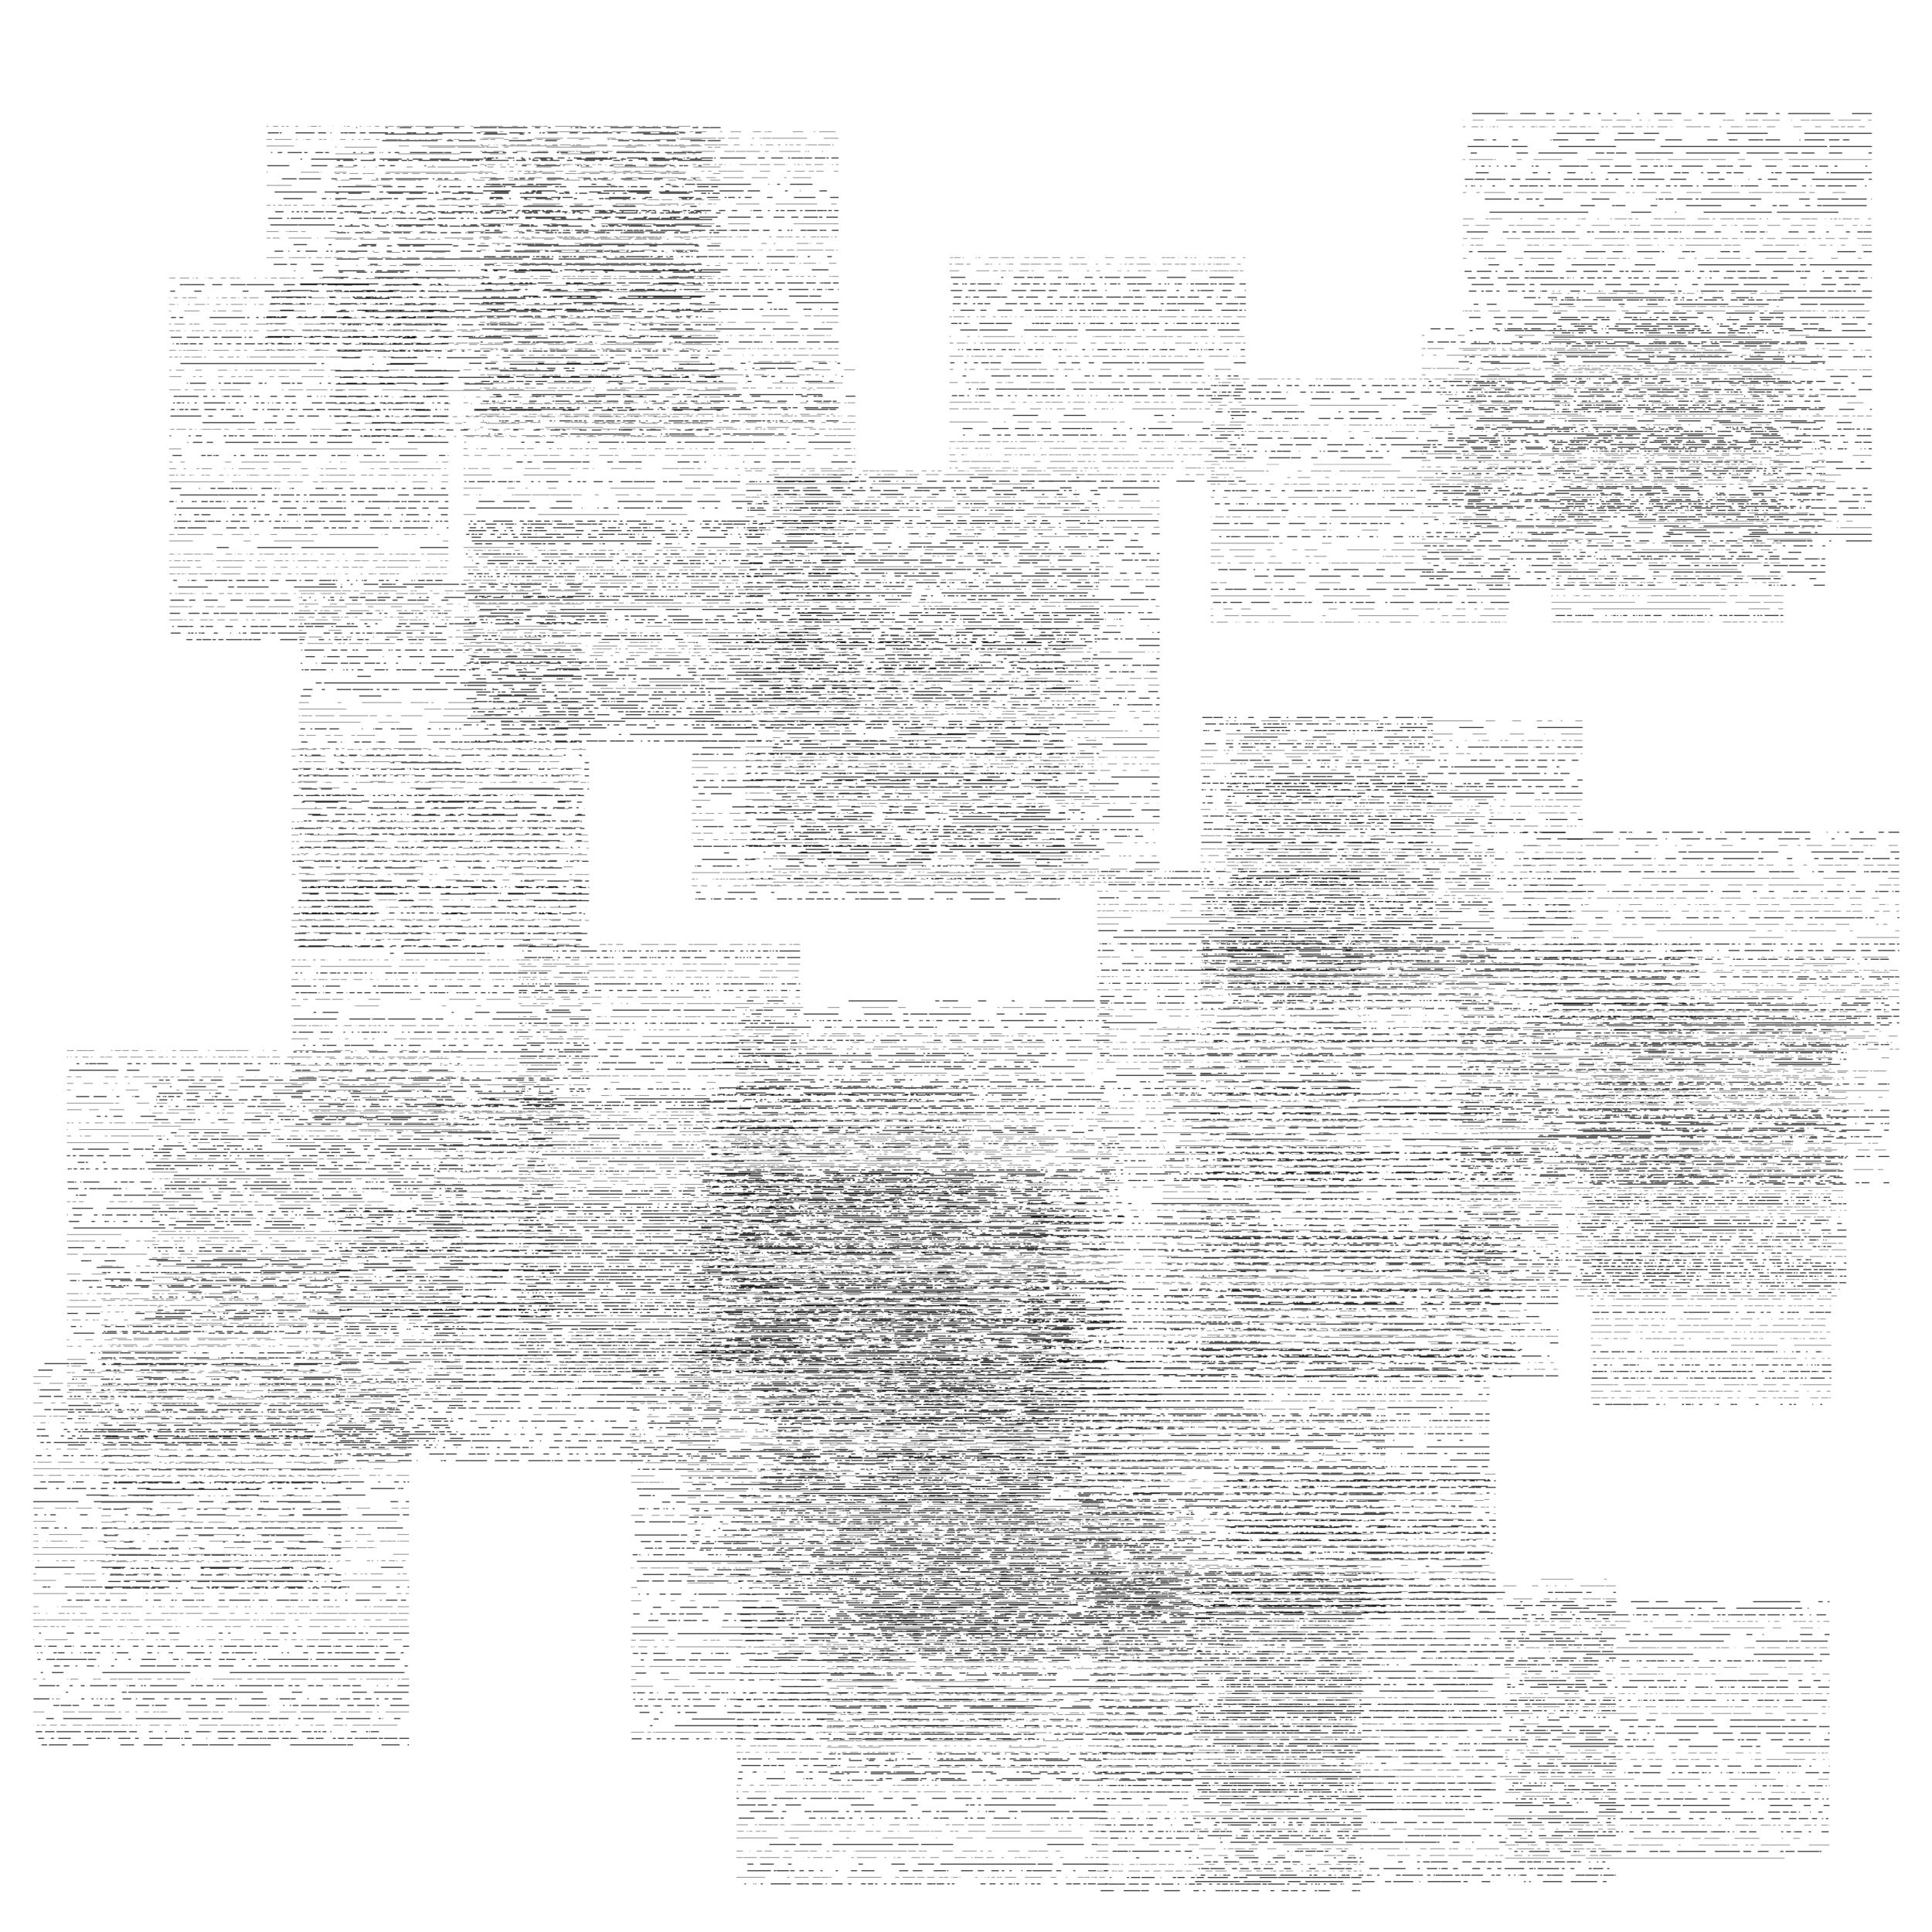 2014 11 10 color boxes - lines shatter-01c.jpg